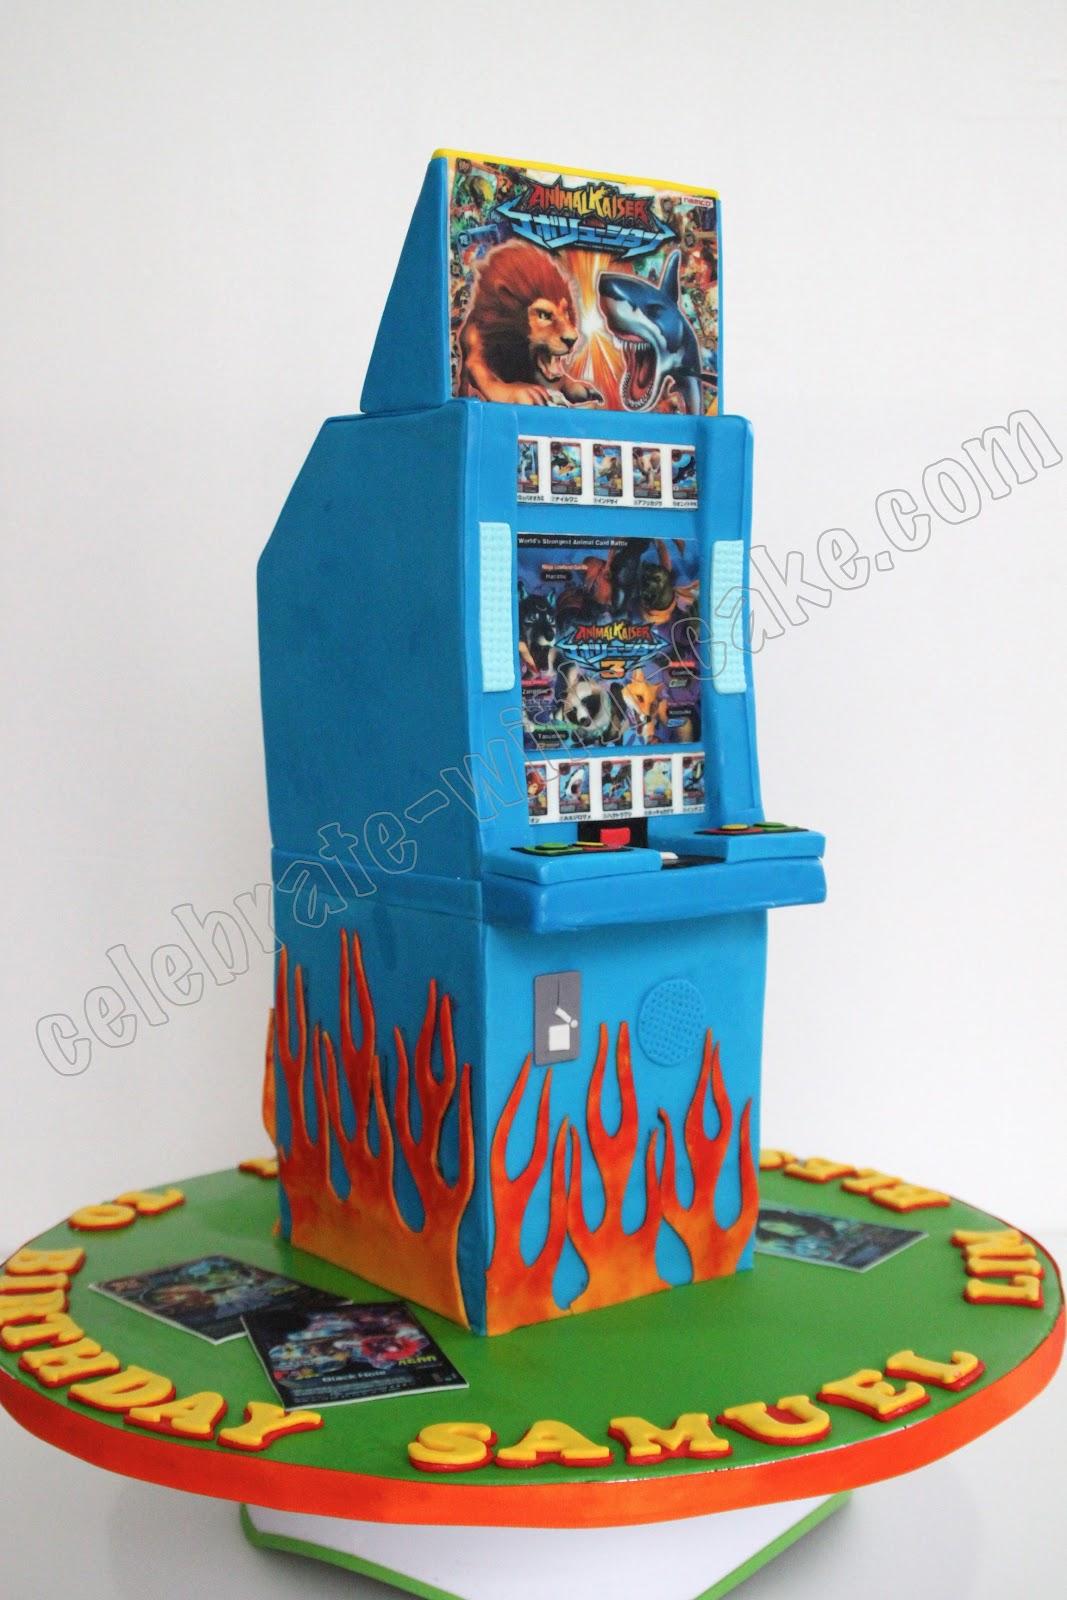 Celebrate With Cake Animal Kaiser Cake